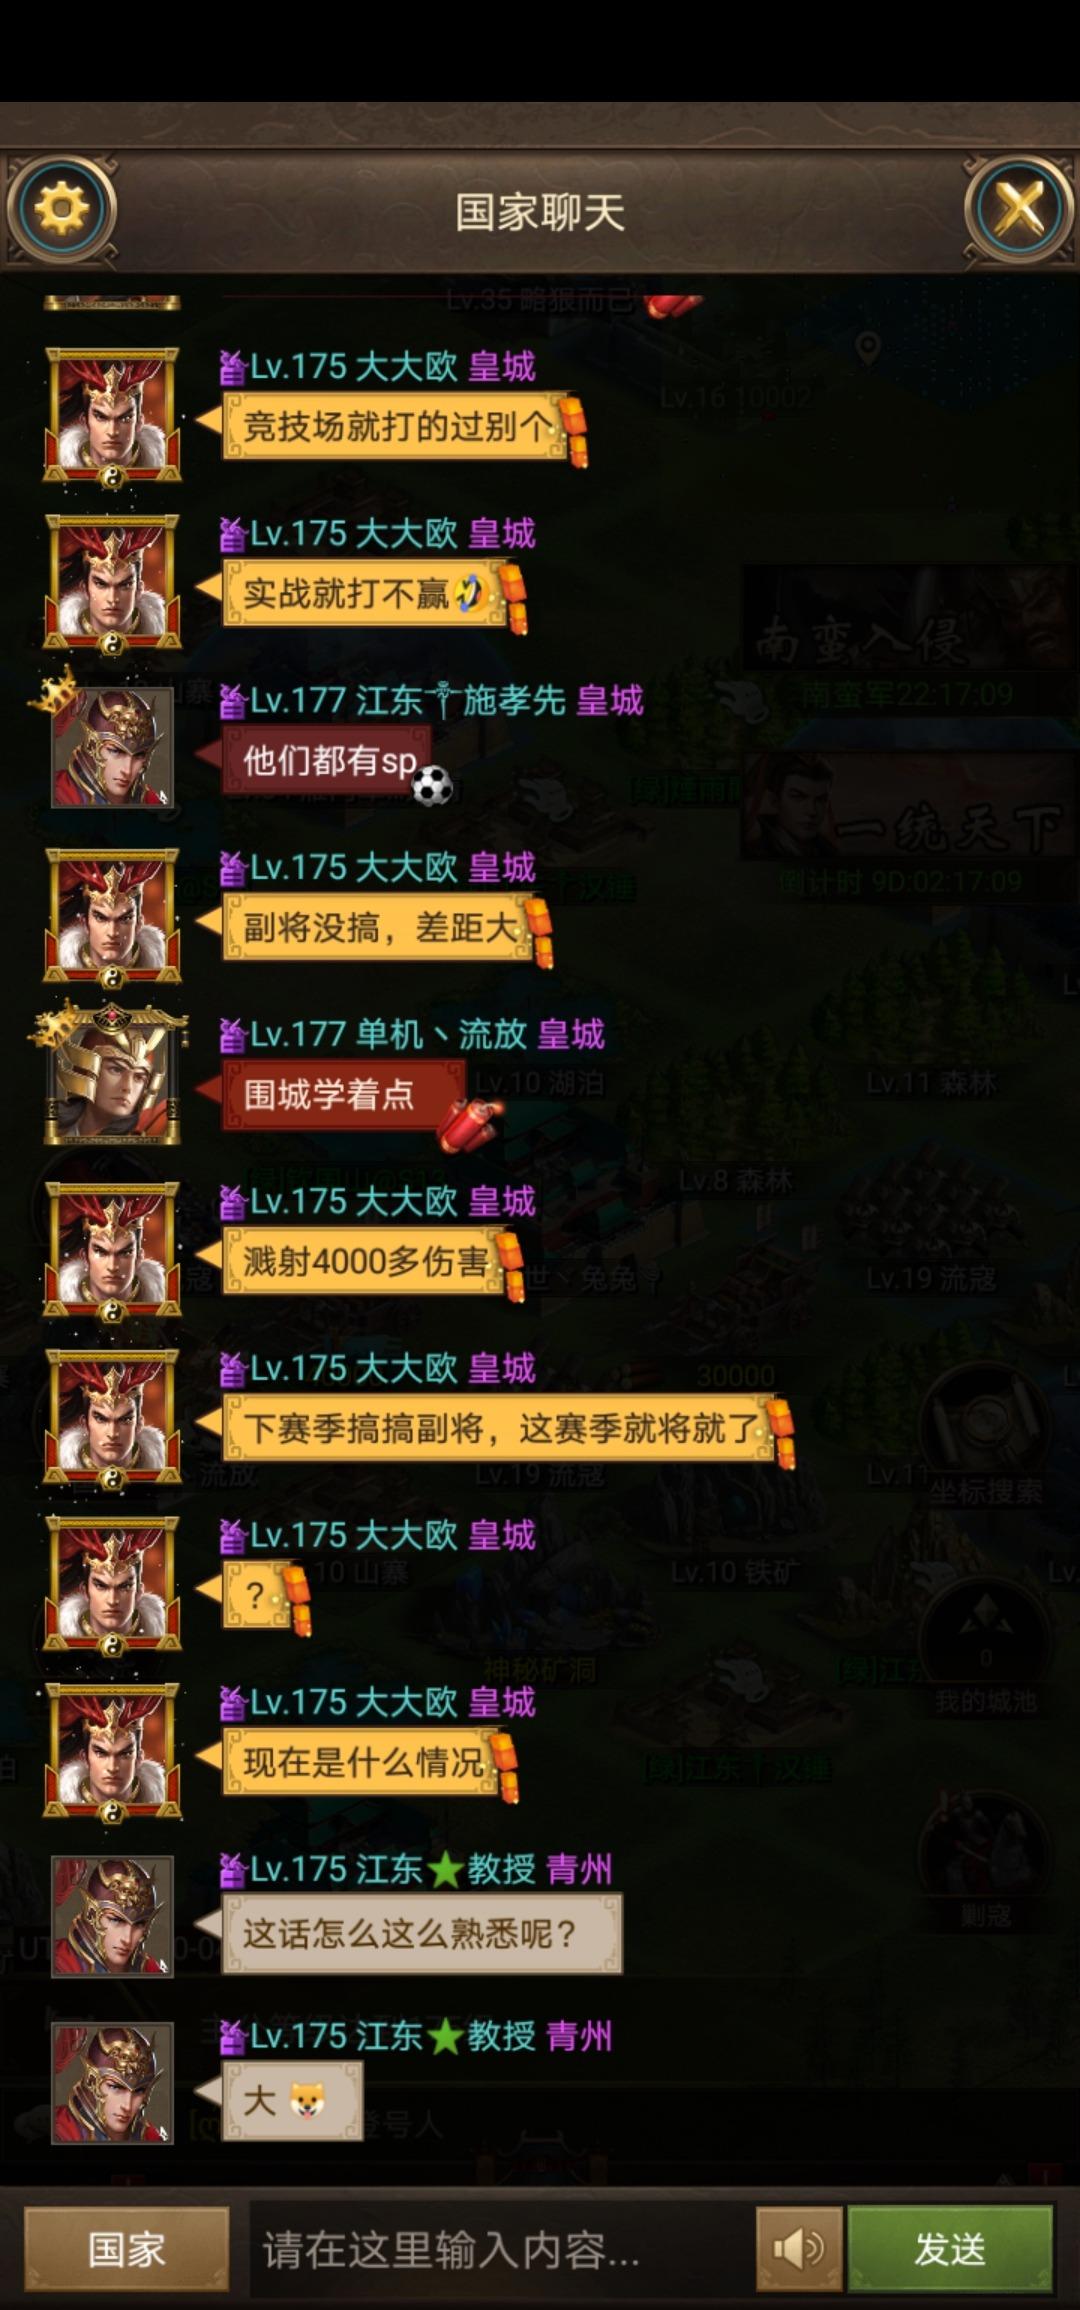 Screenshot_20200422_214252_com.jedigames.rxsg.luobo.jpg